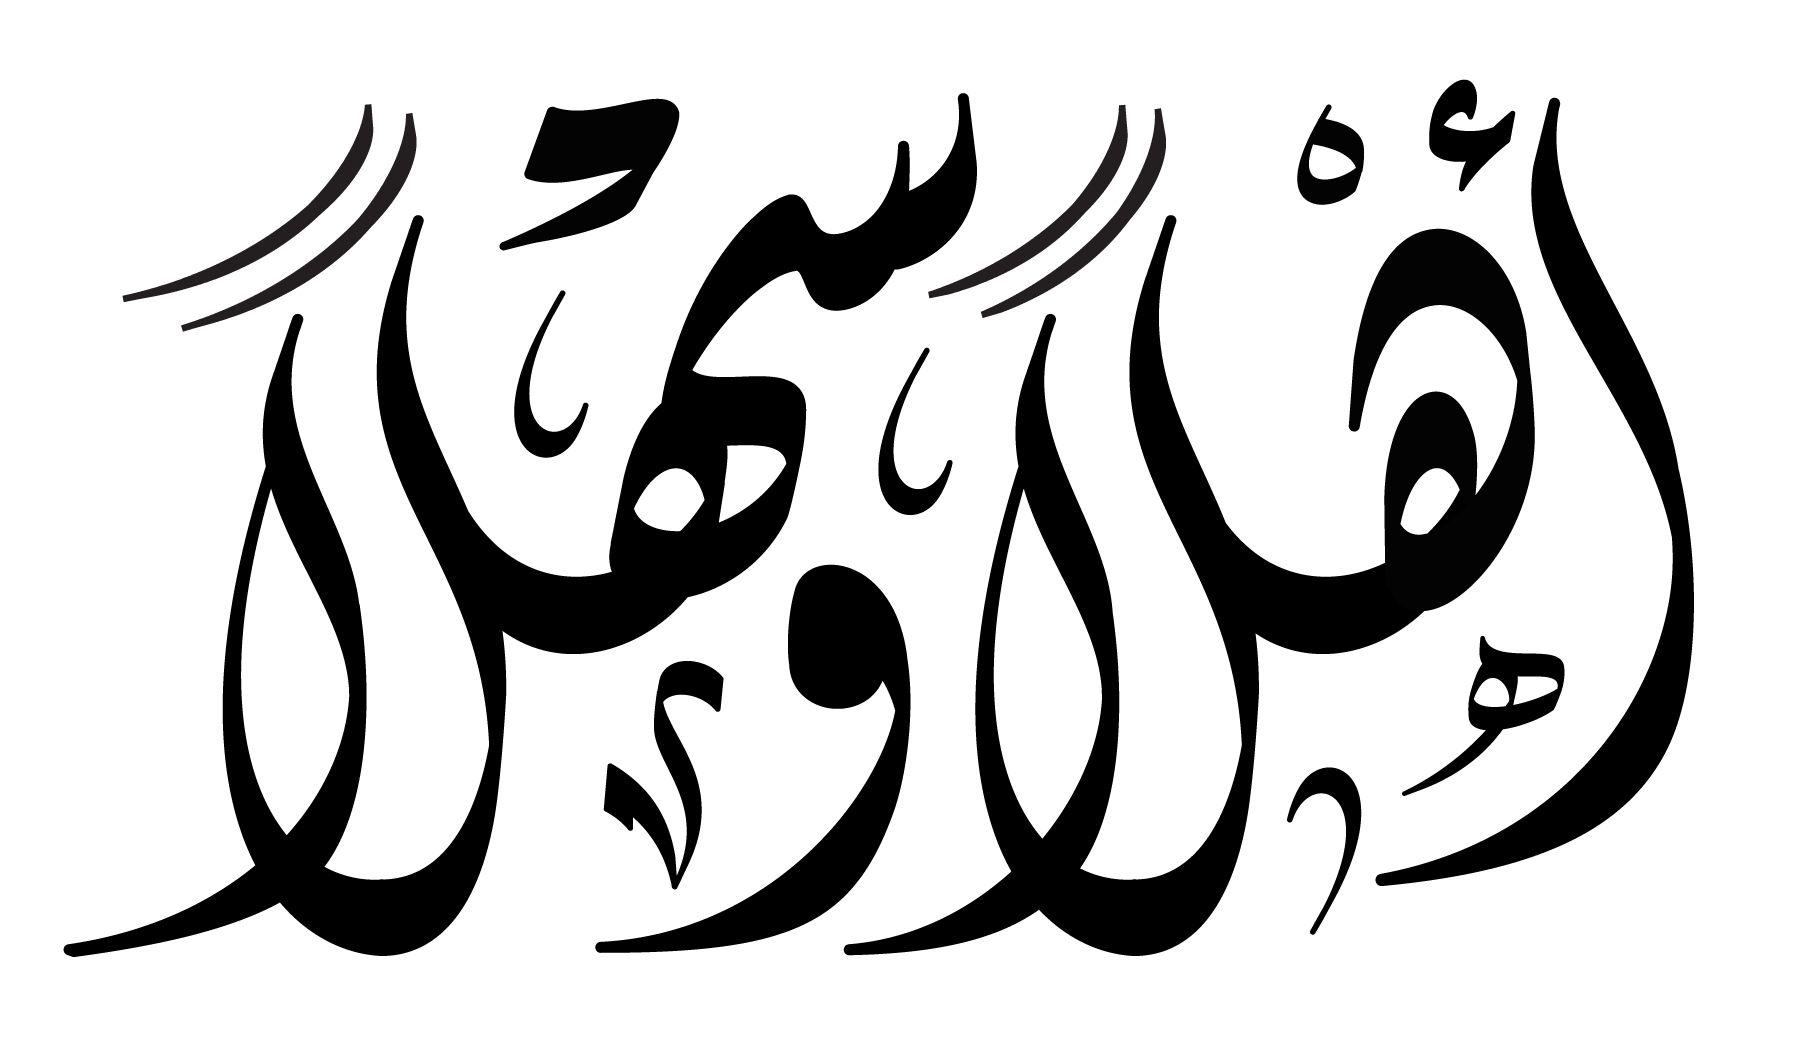 Pin By Sana Desgin On الخط العربي Islamic Art Calligraphy Name Design Art Arabic Calligraphy Art